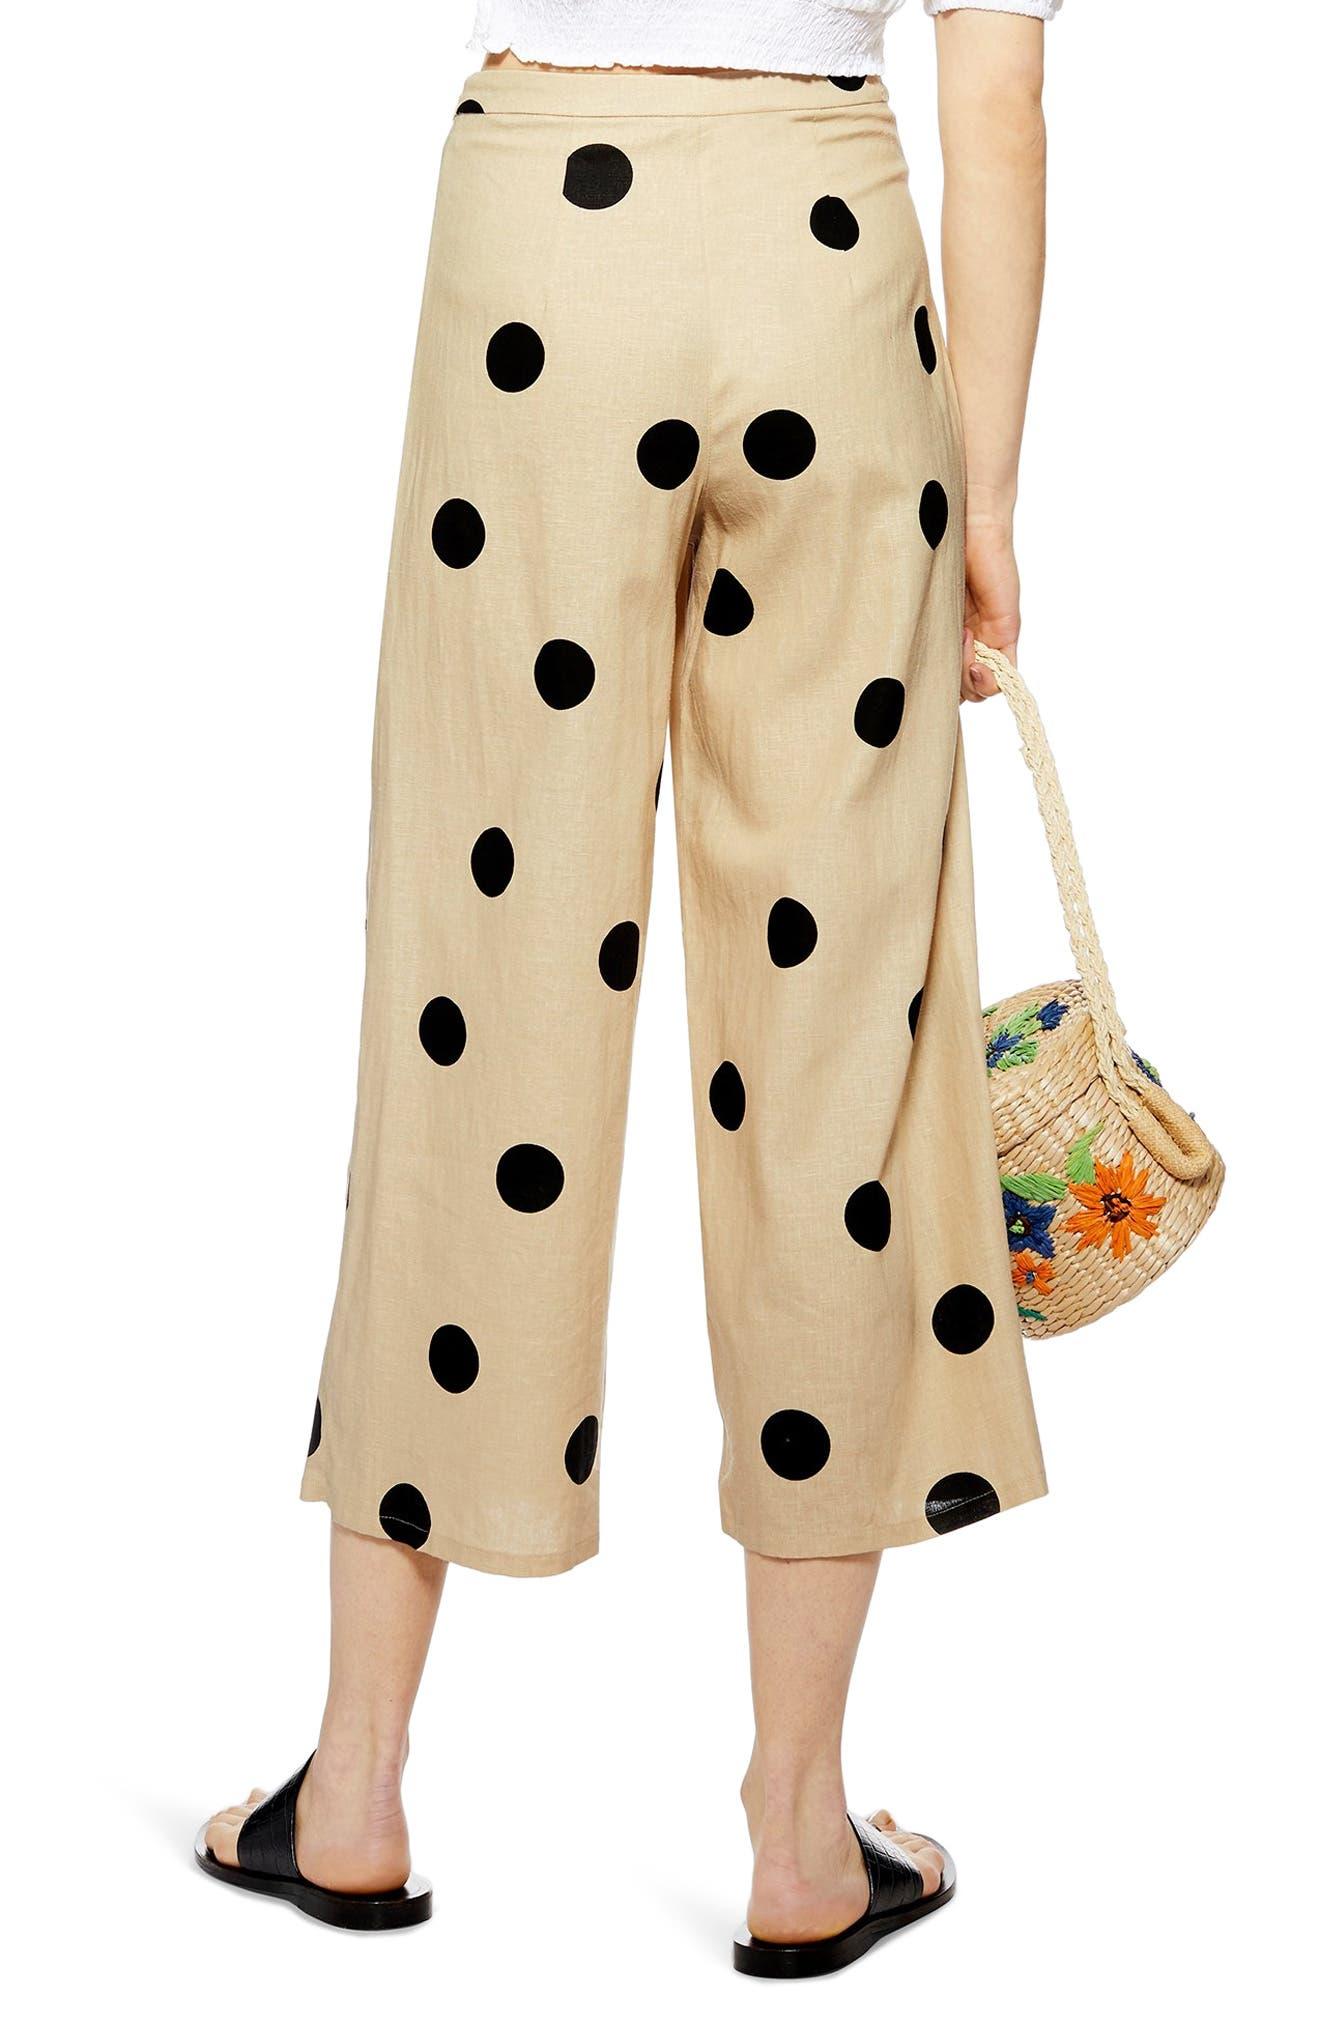 TOPSHOP, Lulu Spot Cropped Wide Leg Pants, Alternate thumbnail 2, color, 250